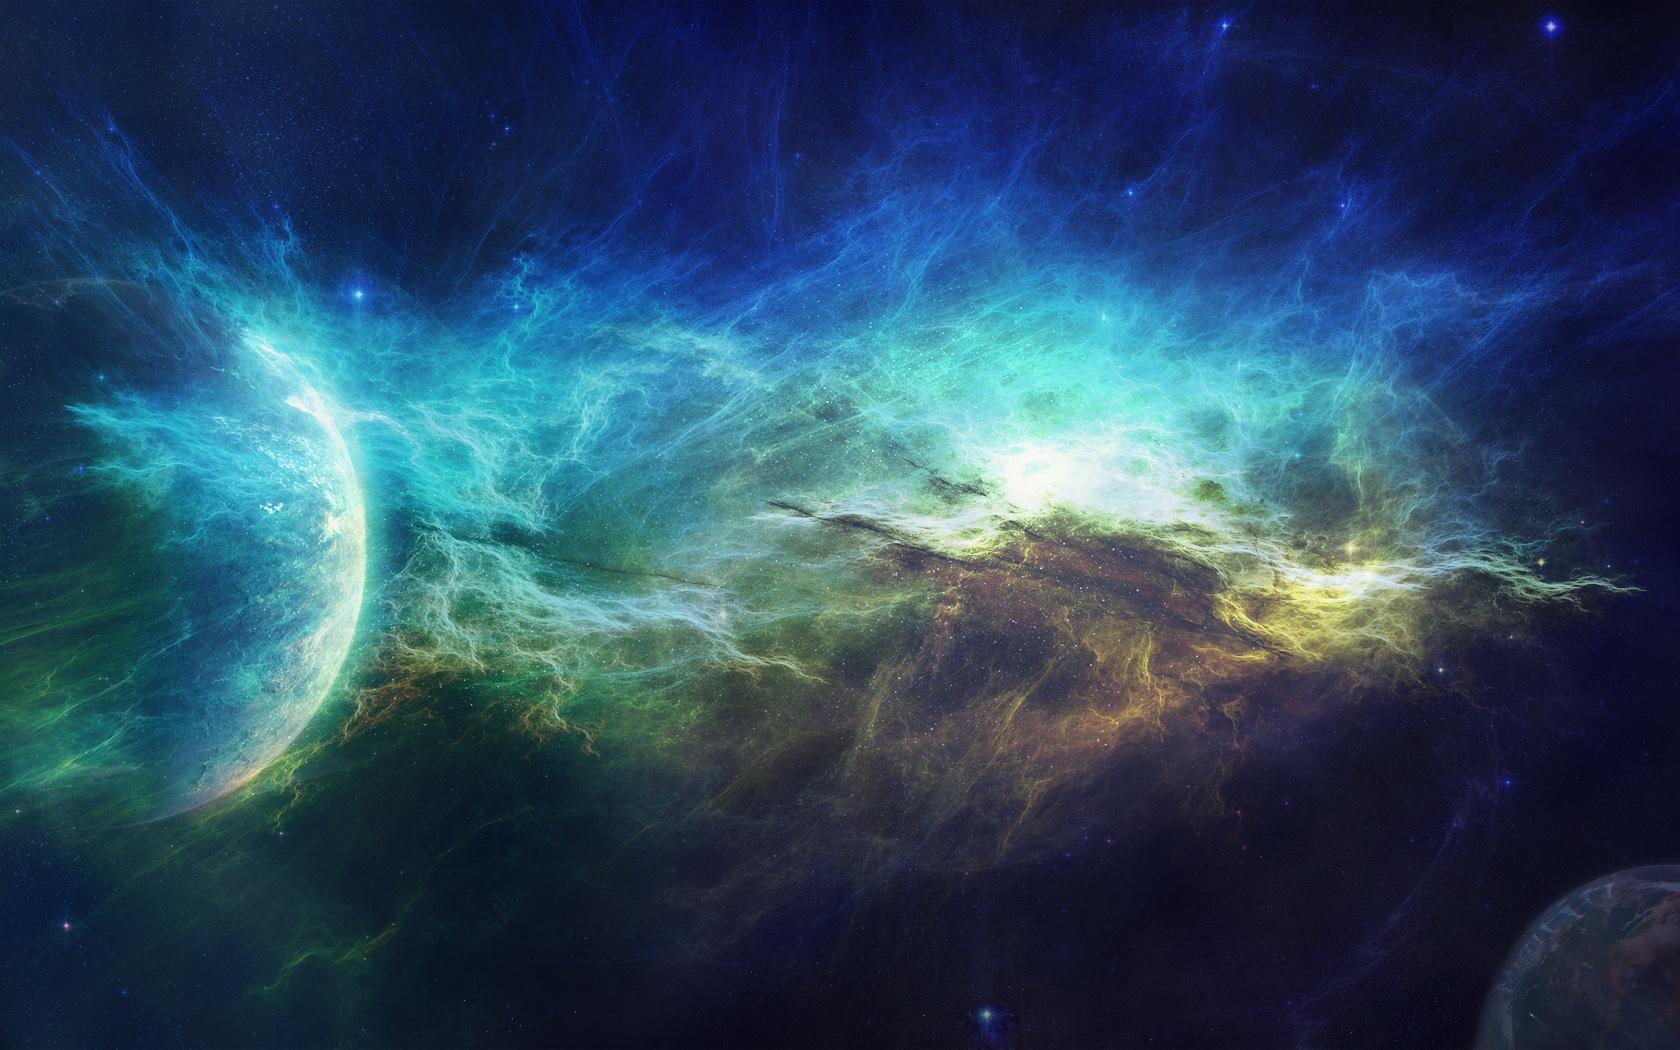 Wallpaper Abstract Galaxy Planet Sky Earth Nebula Universe